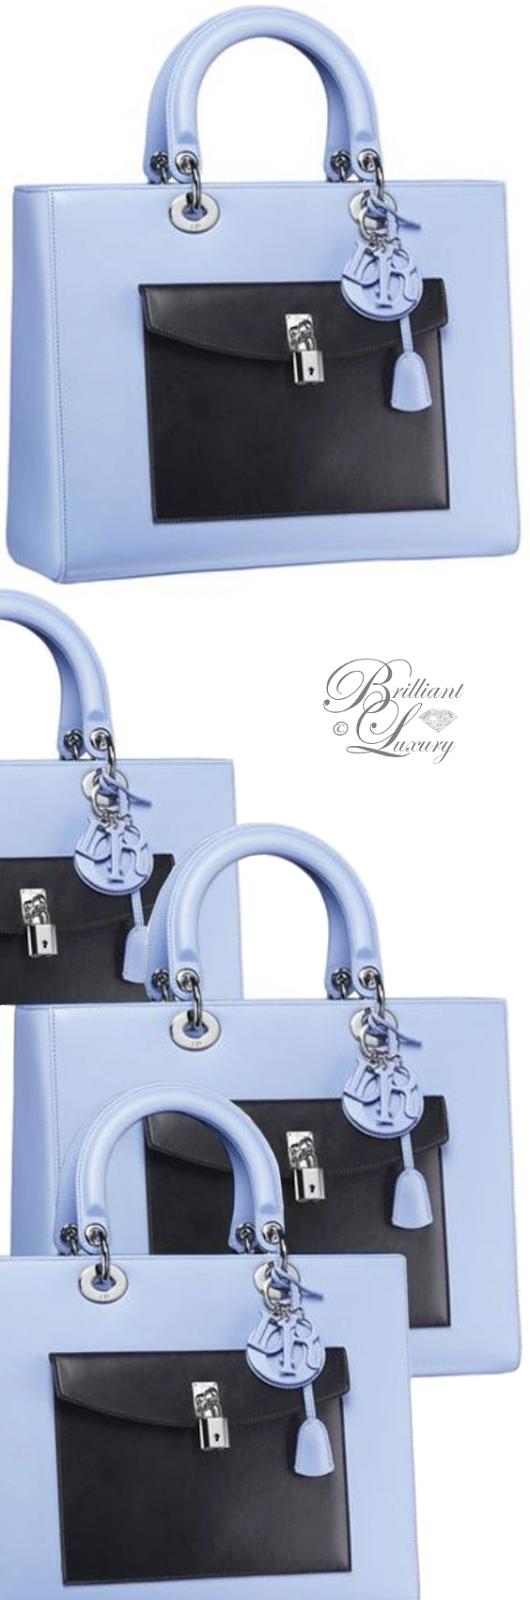 Brilliant Luxury ♦ Dior Lady Dior 'Bleu Jeans Lambskin' Bag